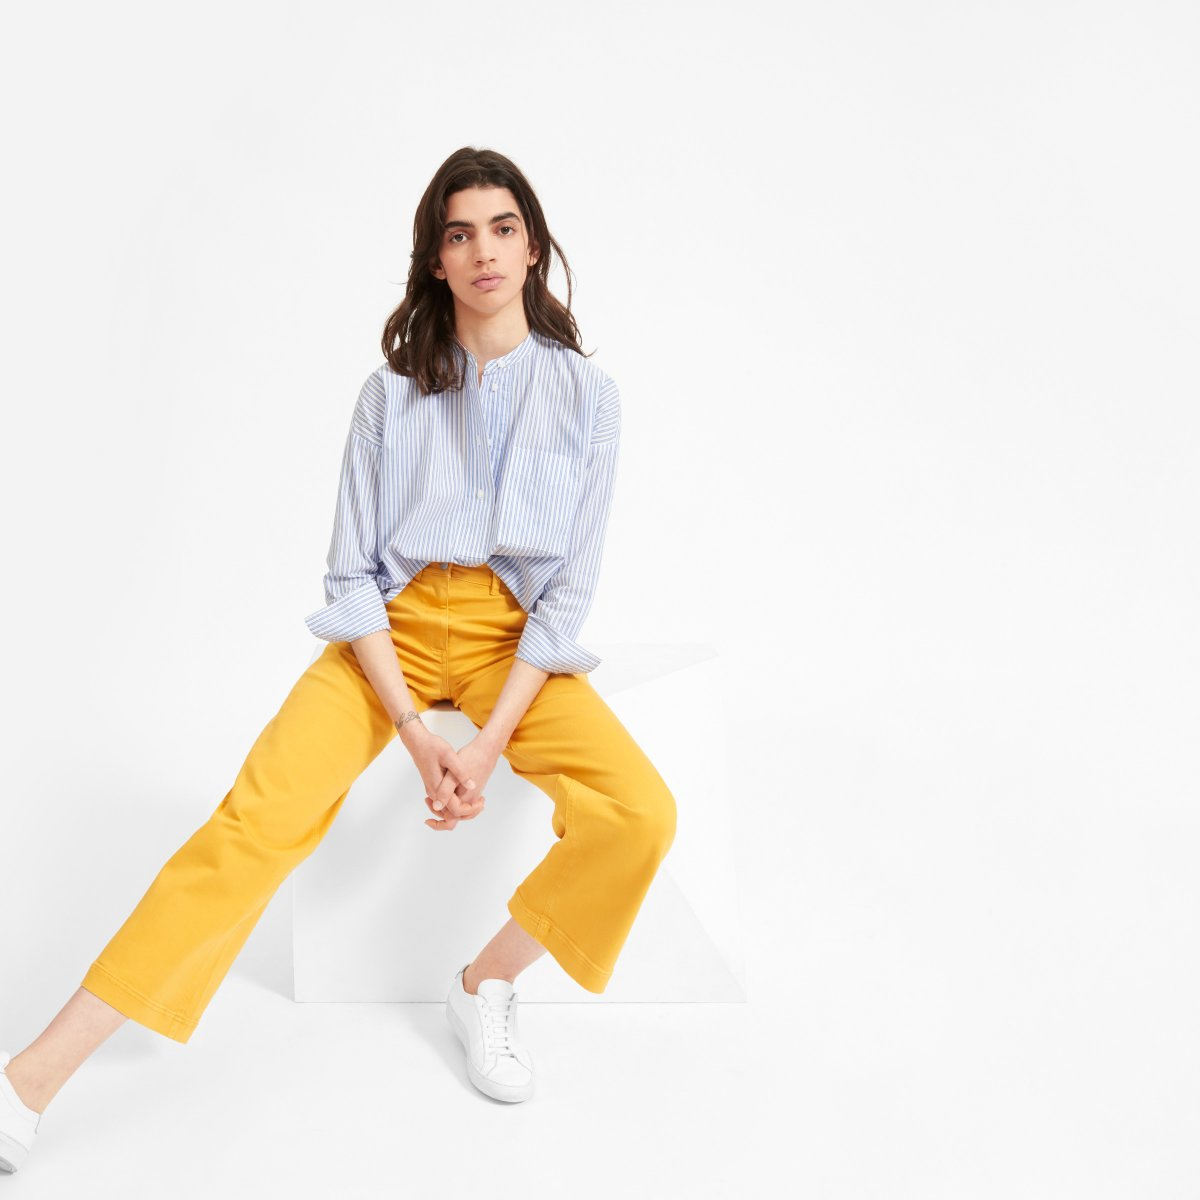 Everlane Choose What You Pay / Cotton Shirt - Sunshine Style, A Florida Based Fashion Blog